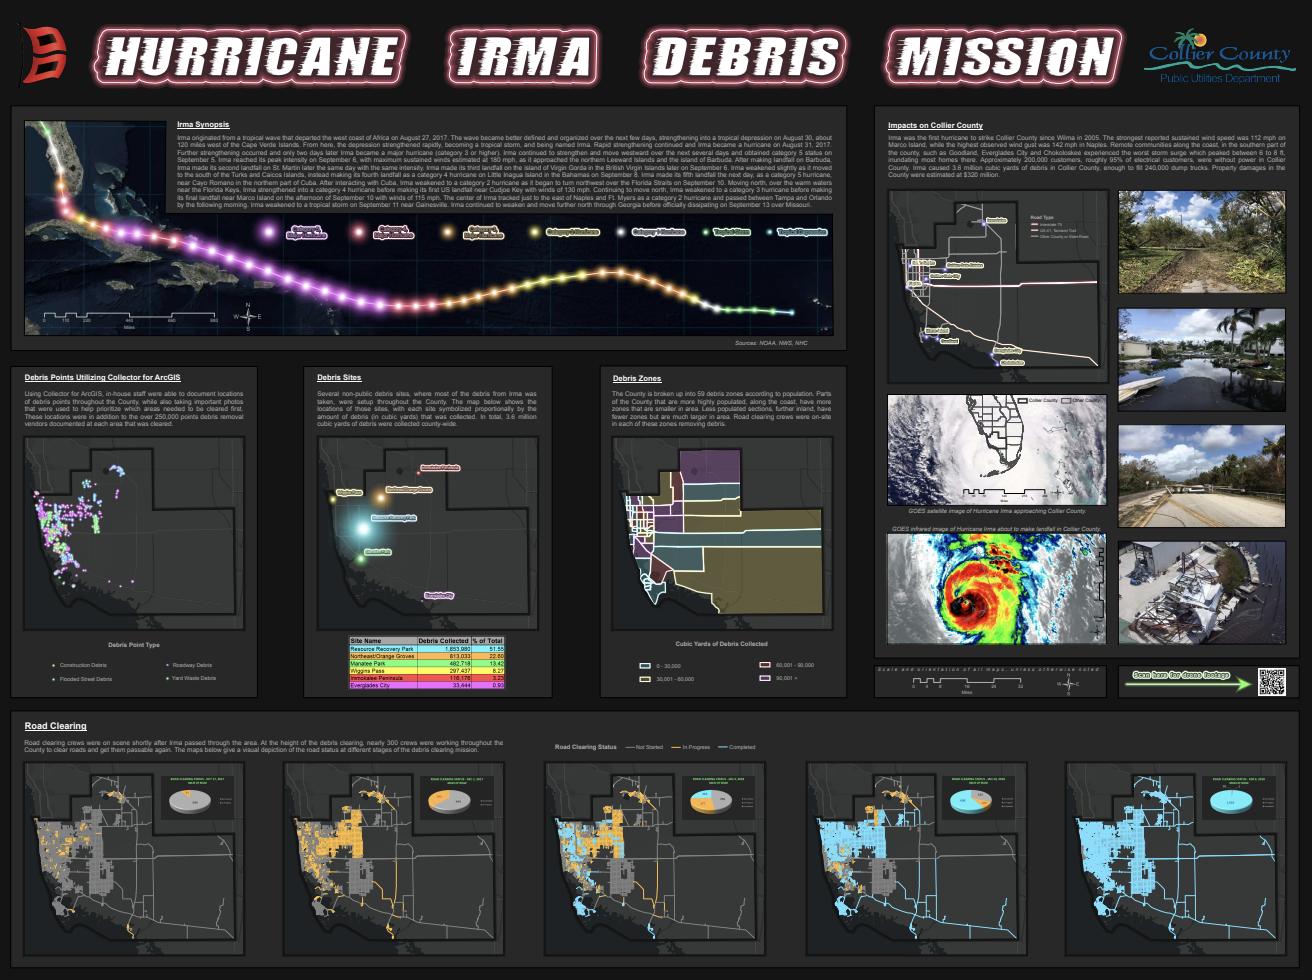 Hurricane Irma Debris Mission